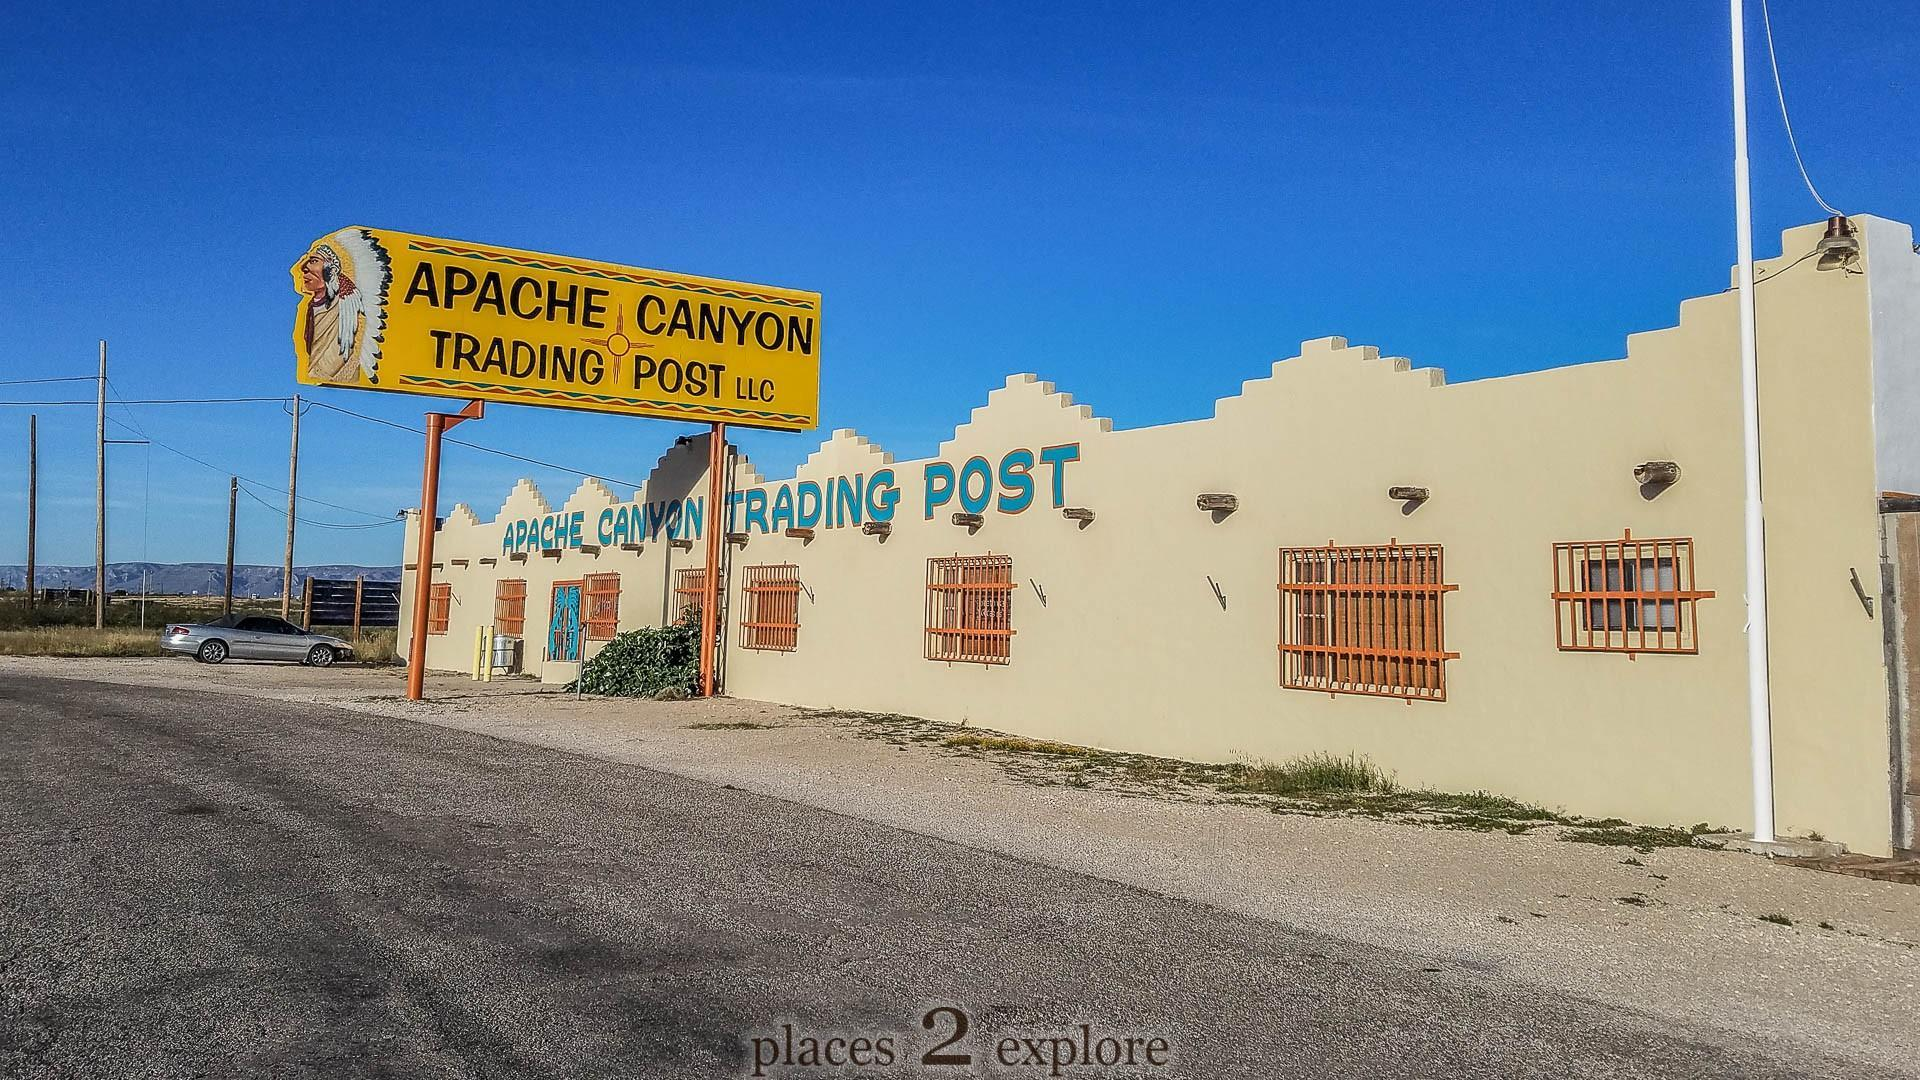 Apache Canyon Trading Post